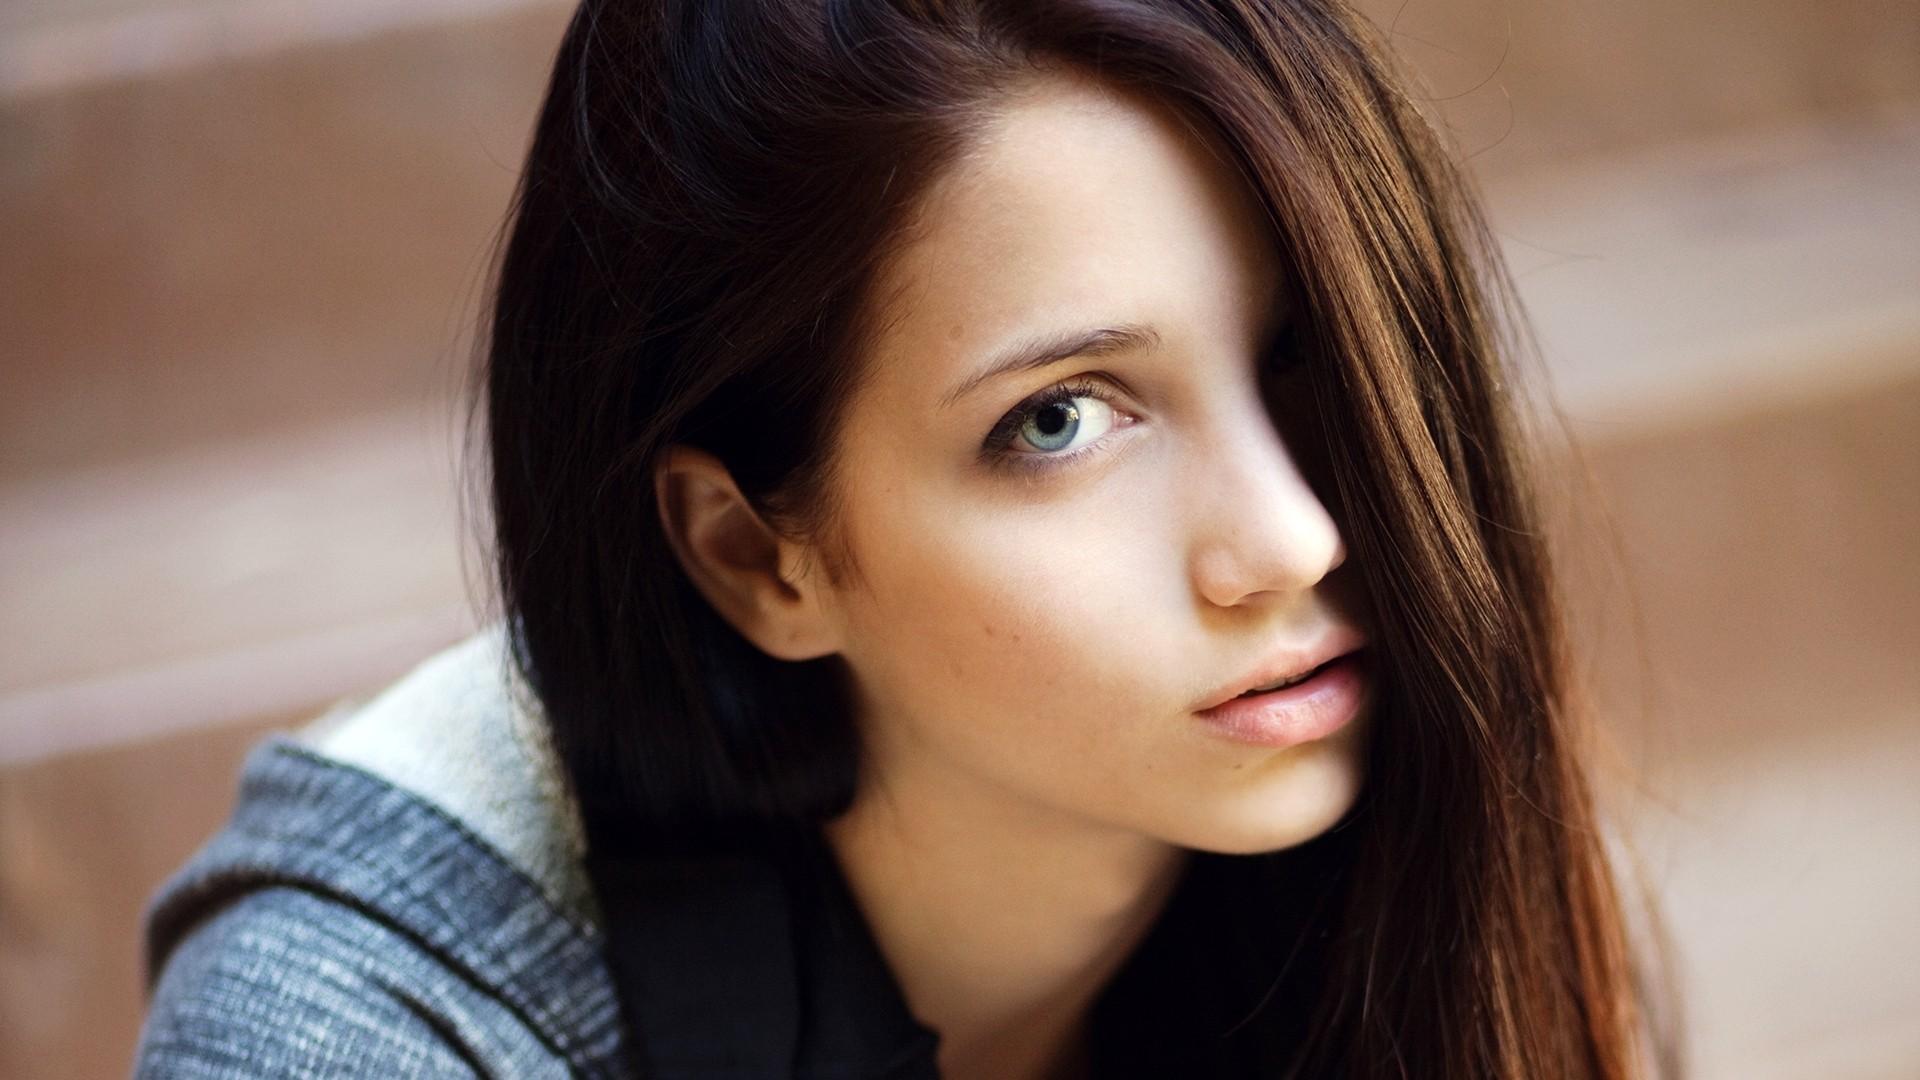 Hintergrundbilder : Gesicht, Frau, Modell-, Porträt